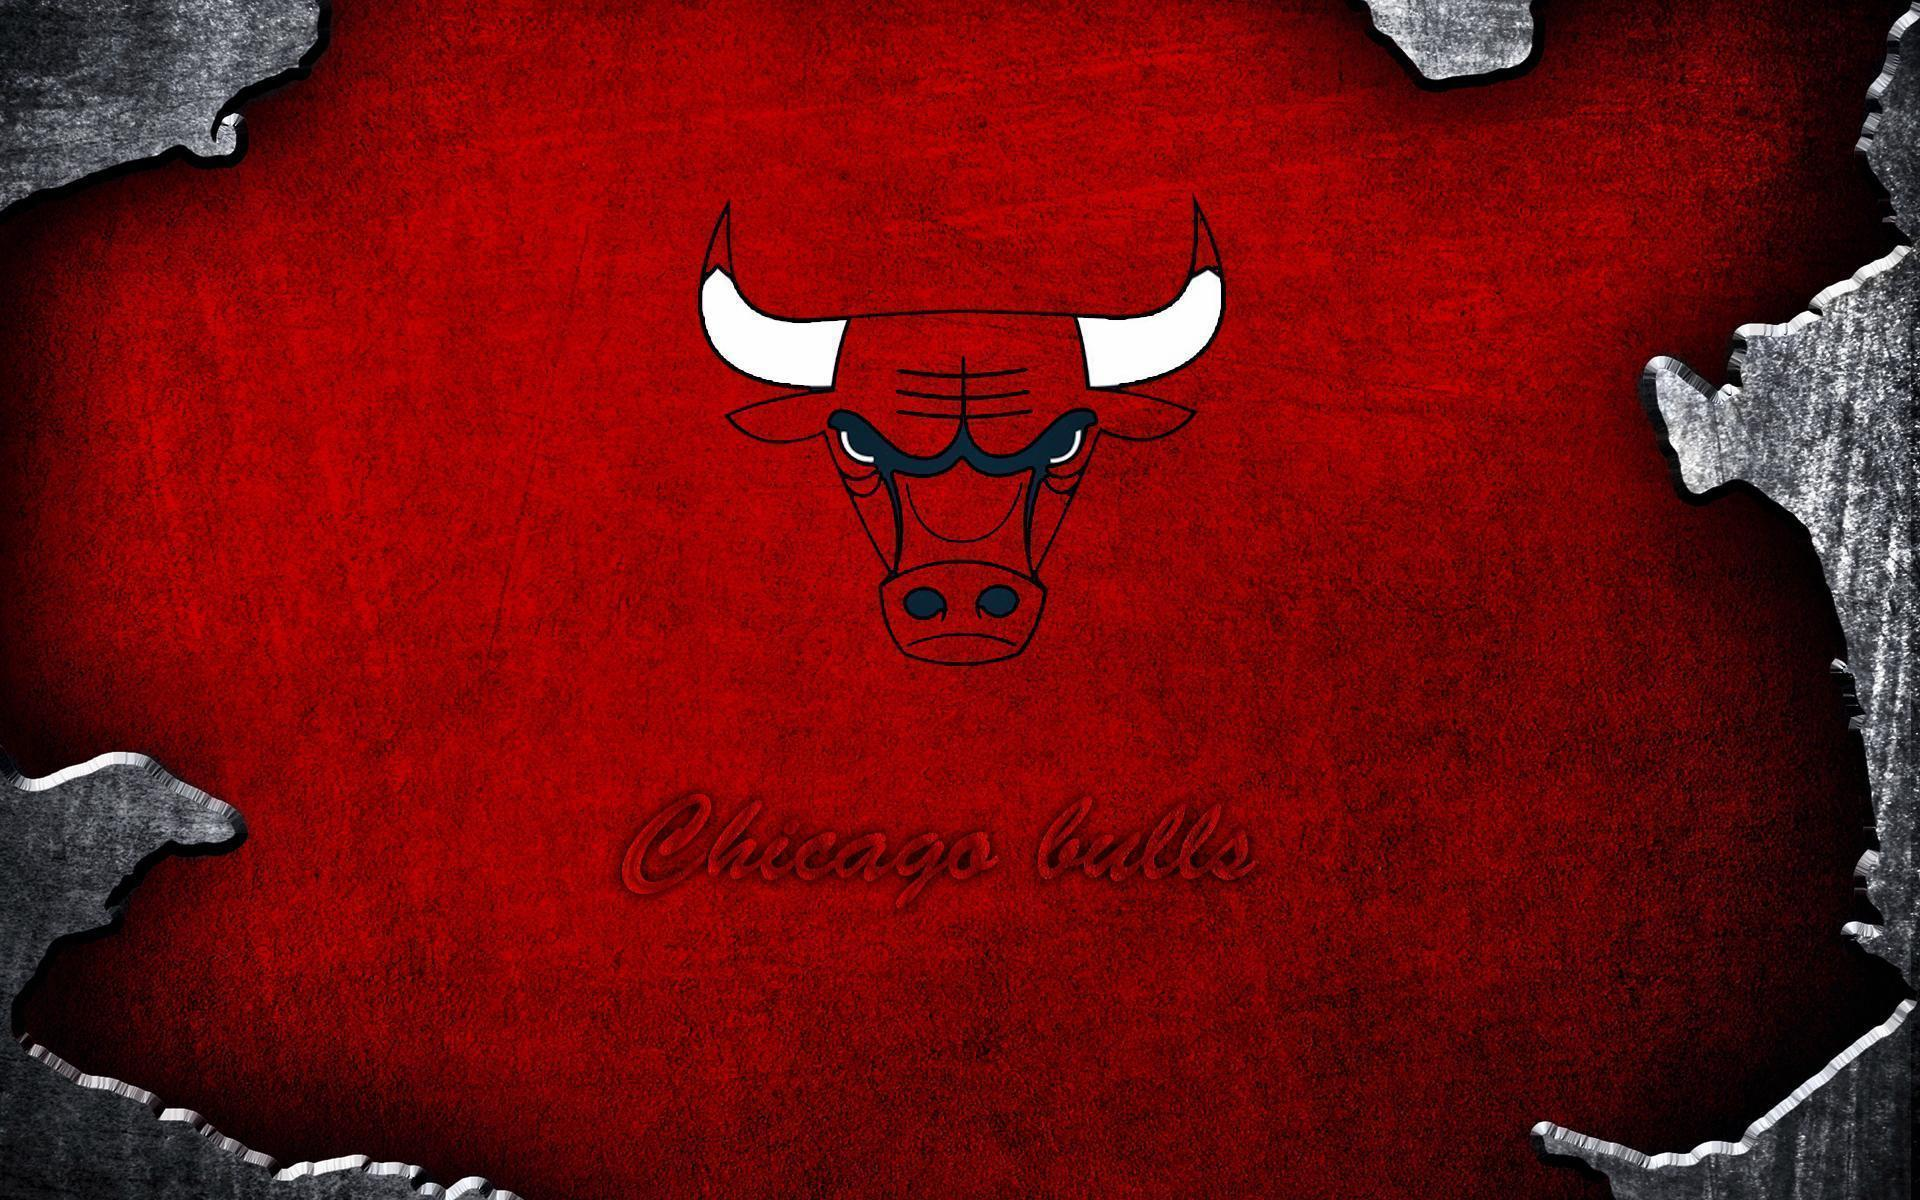 Chicago Bulls Wallpaper 2012 Hd Backgrounds 12 Pics